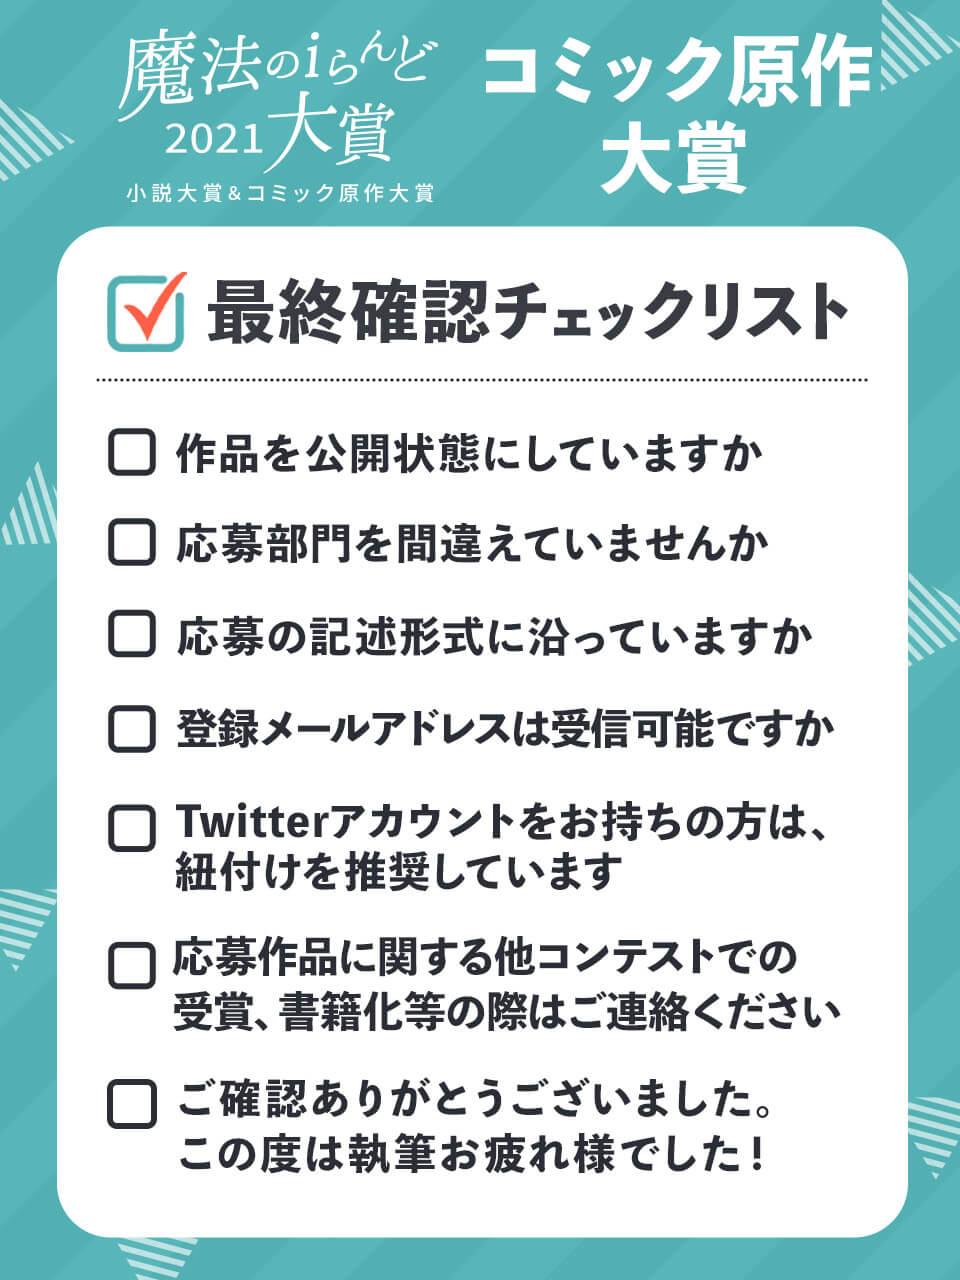 https://storage.googleapis.com/blog-info/entry/2021/09/210917-mahoaward-checklist_twitter-comic.jpg